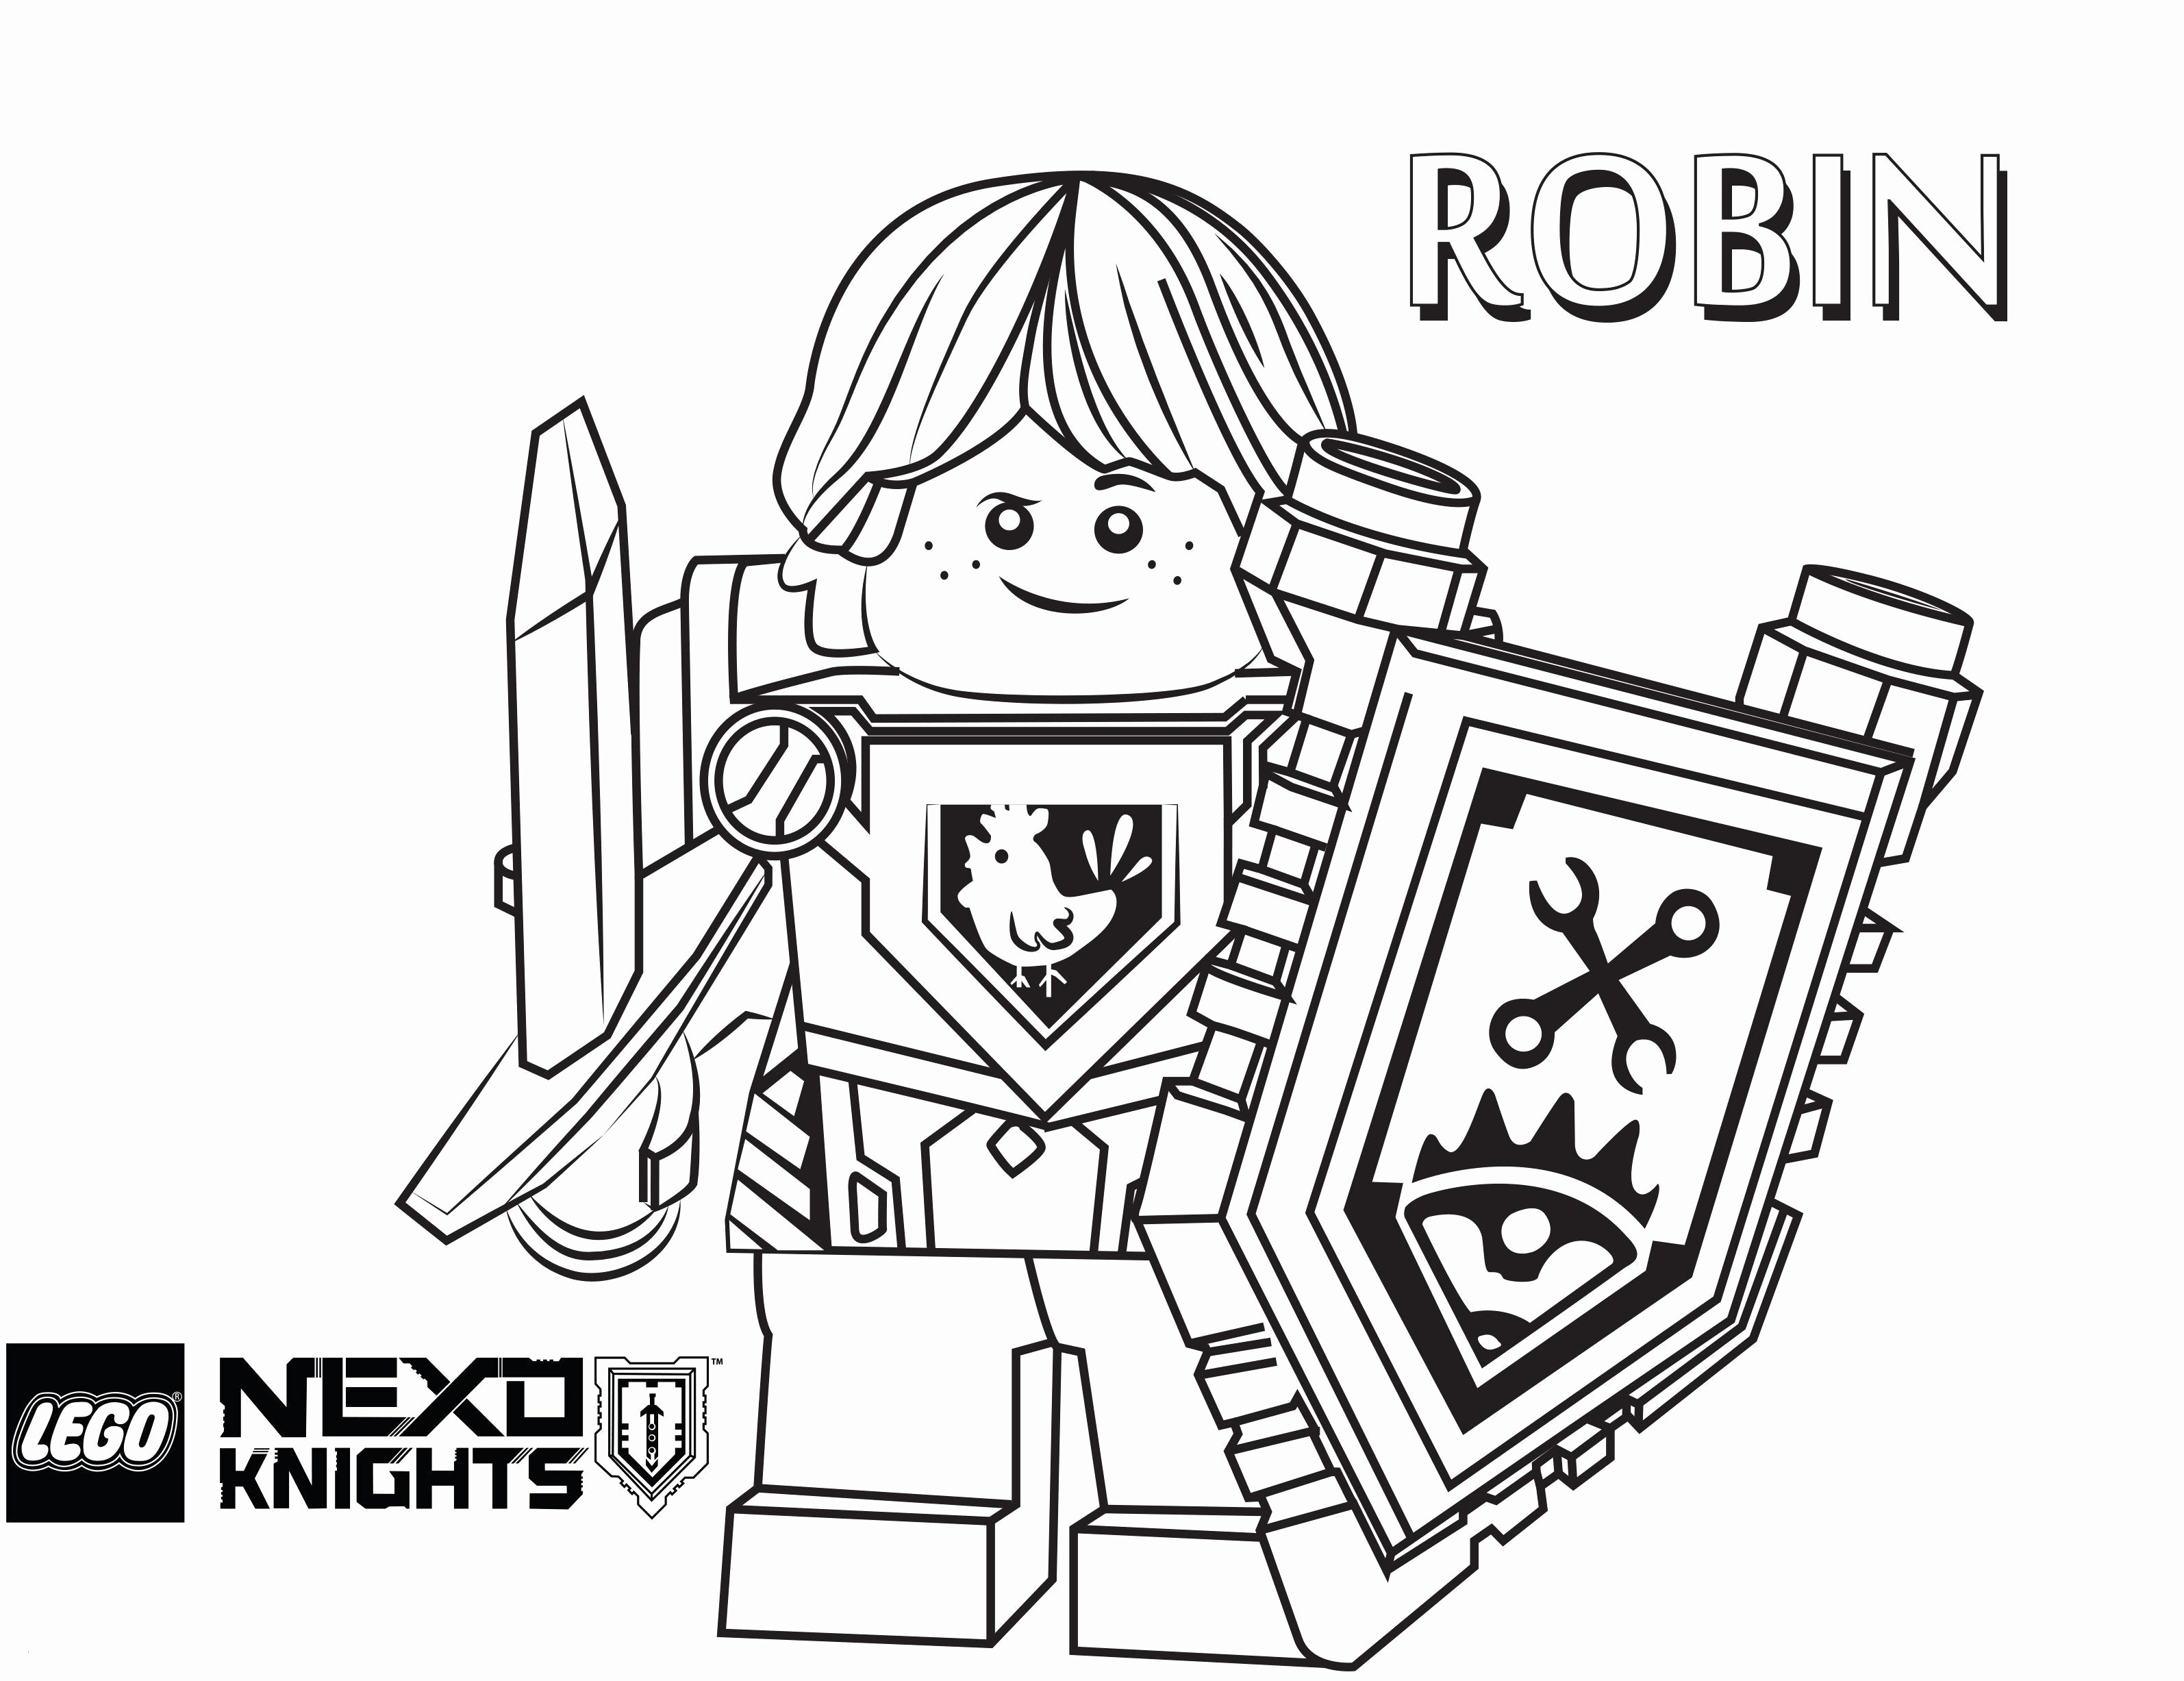 Ninjago Lloyd Ausmalbild Genial Coloriage Lego Nexo Knights élégant 37 Lego Ninjago Lloyd Fotografieren